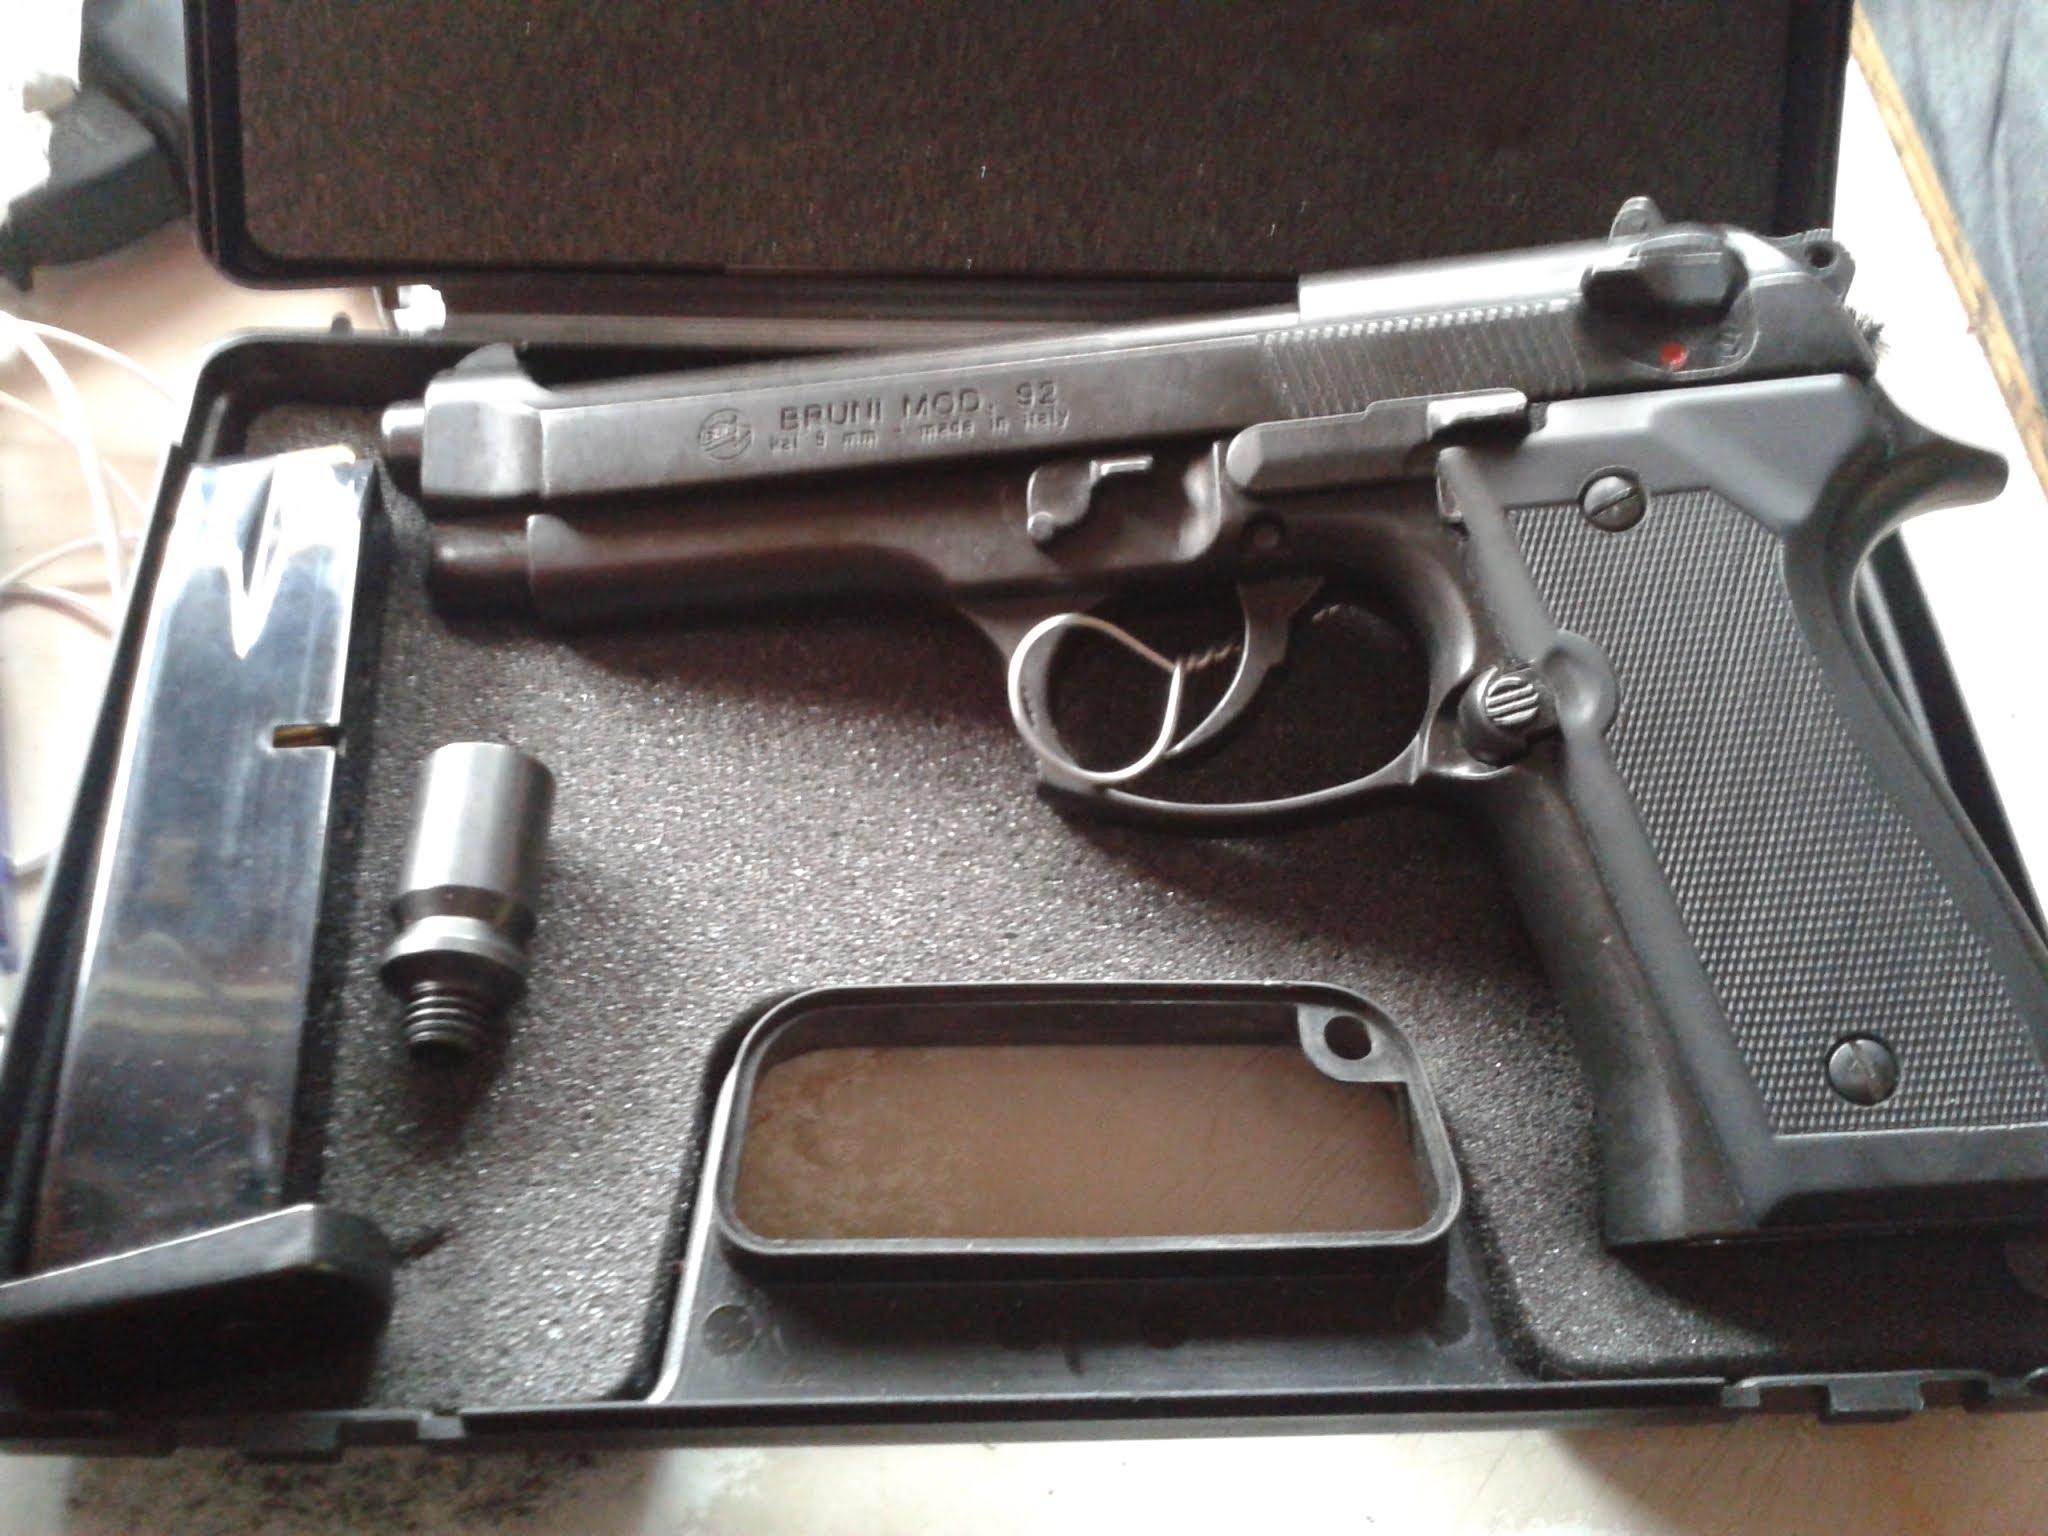 pistol BRUNI, model 92